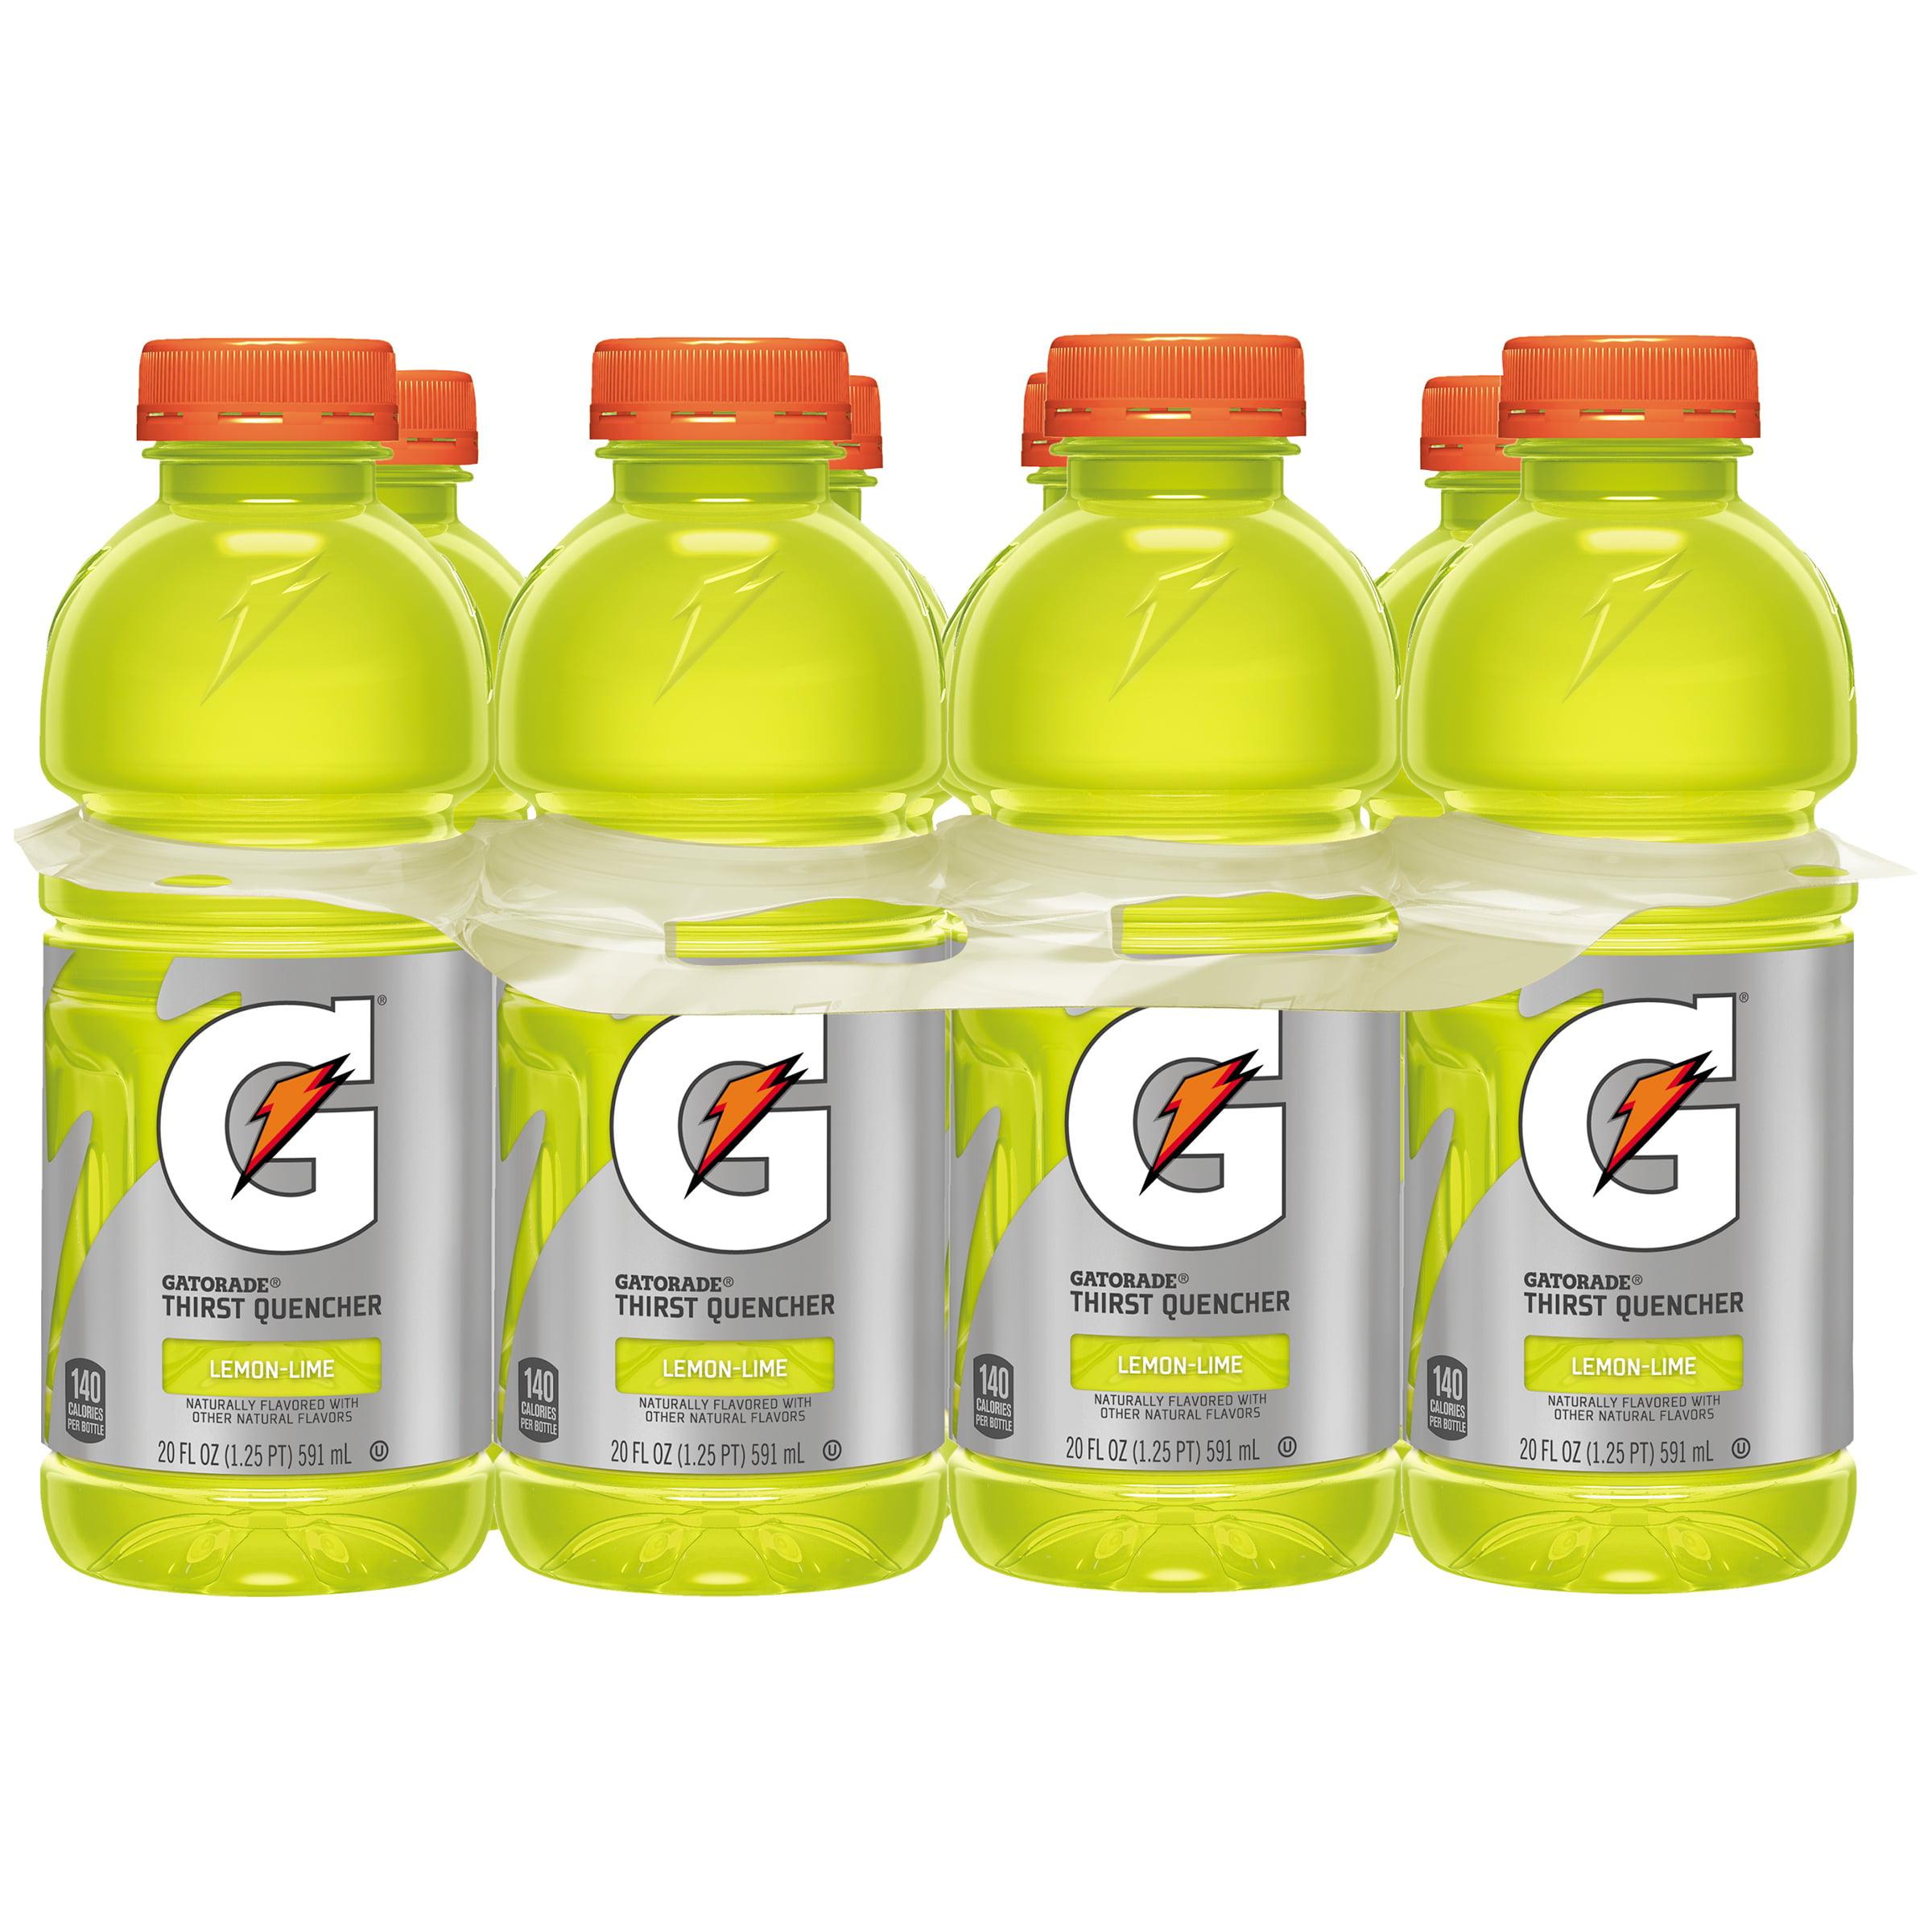 Gatorade Thirst Quencher Sports Drink, Lemon-Lime, 20 Fl Oz, 8 Count